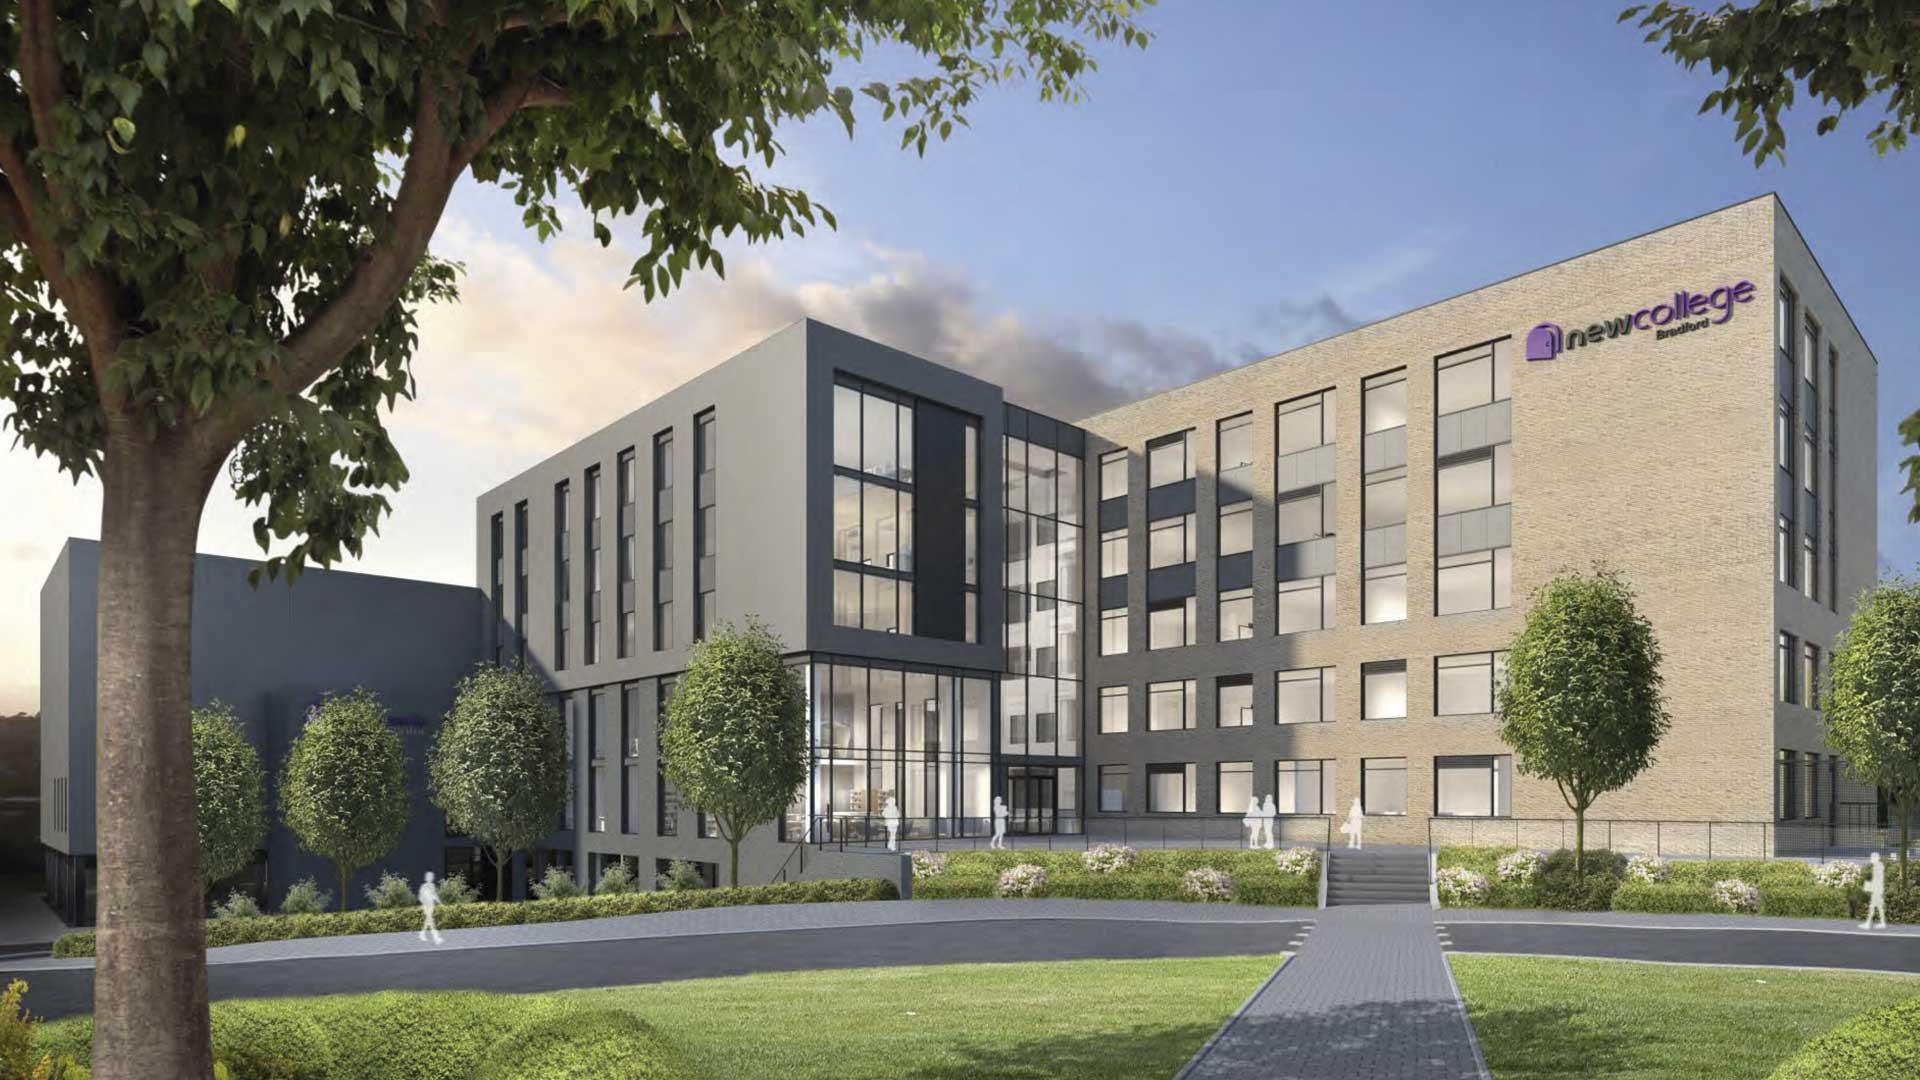 Bradford New College